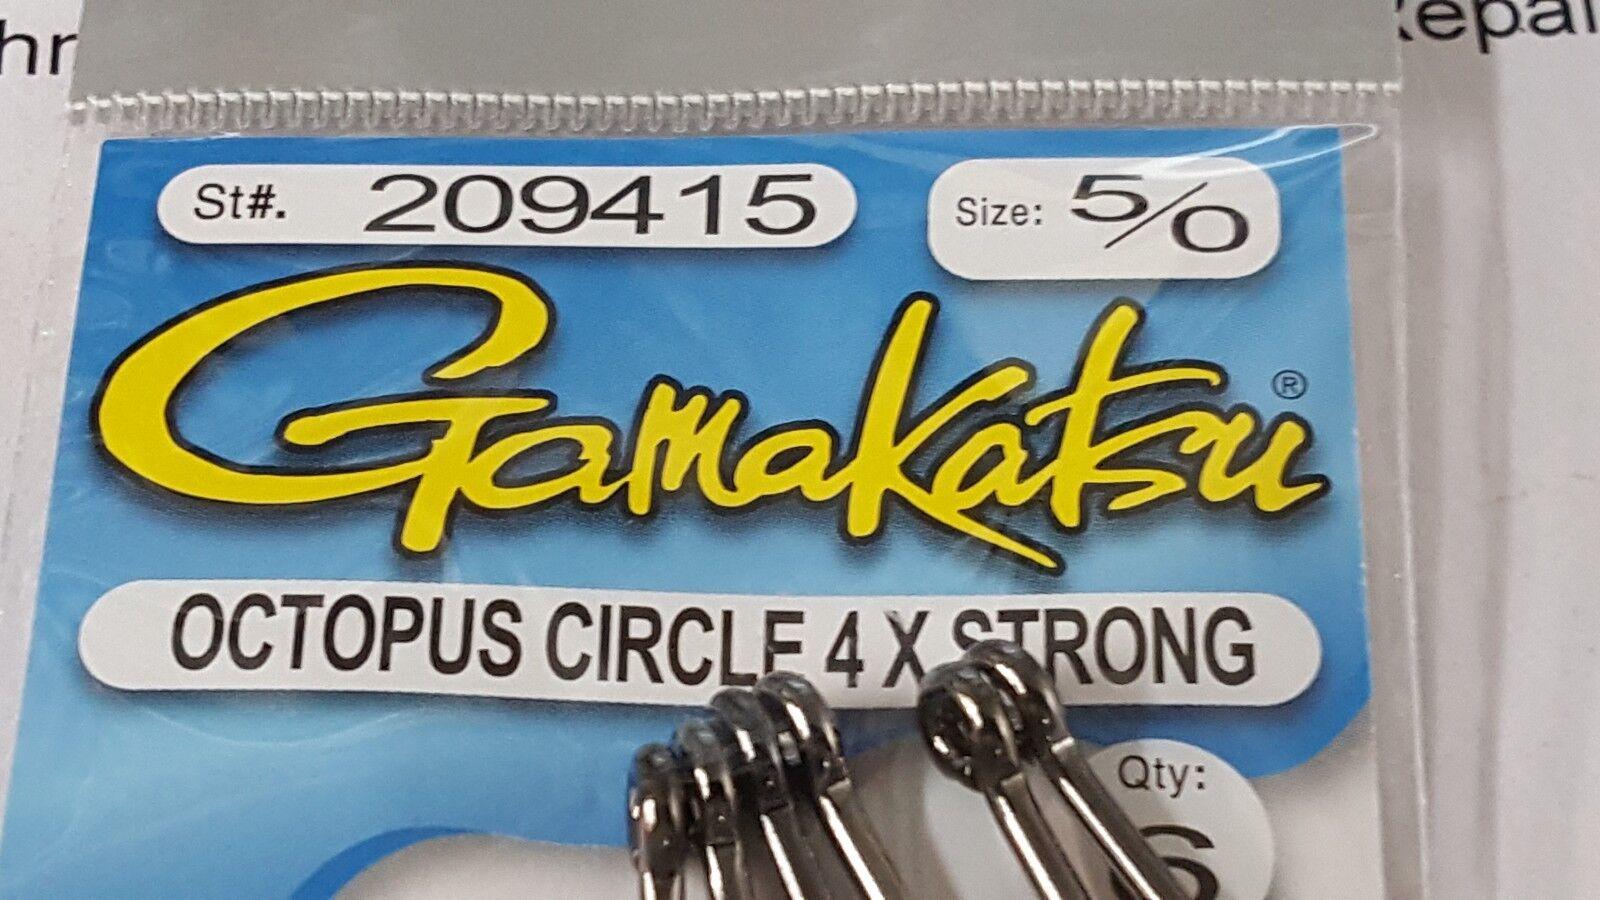 1 Pack Gamakatsu Octopus Circle 4X STRONG Hooks 5//0 #209415 6 Pack FREE SHIPPING